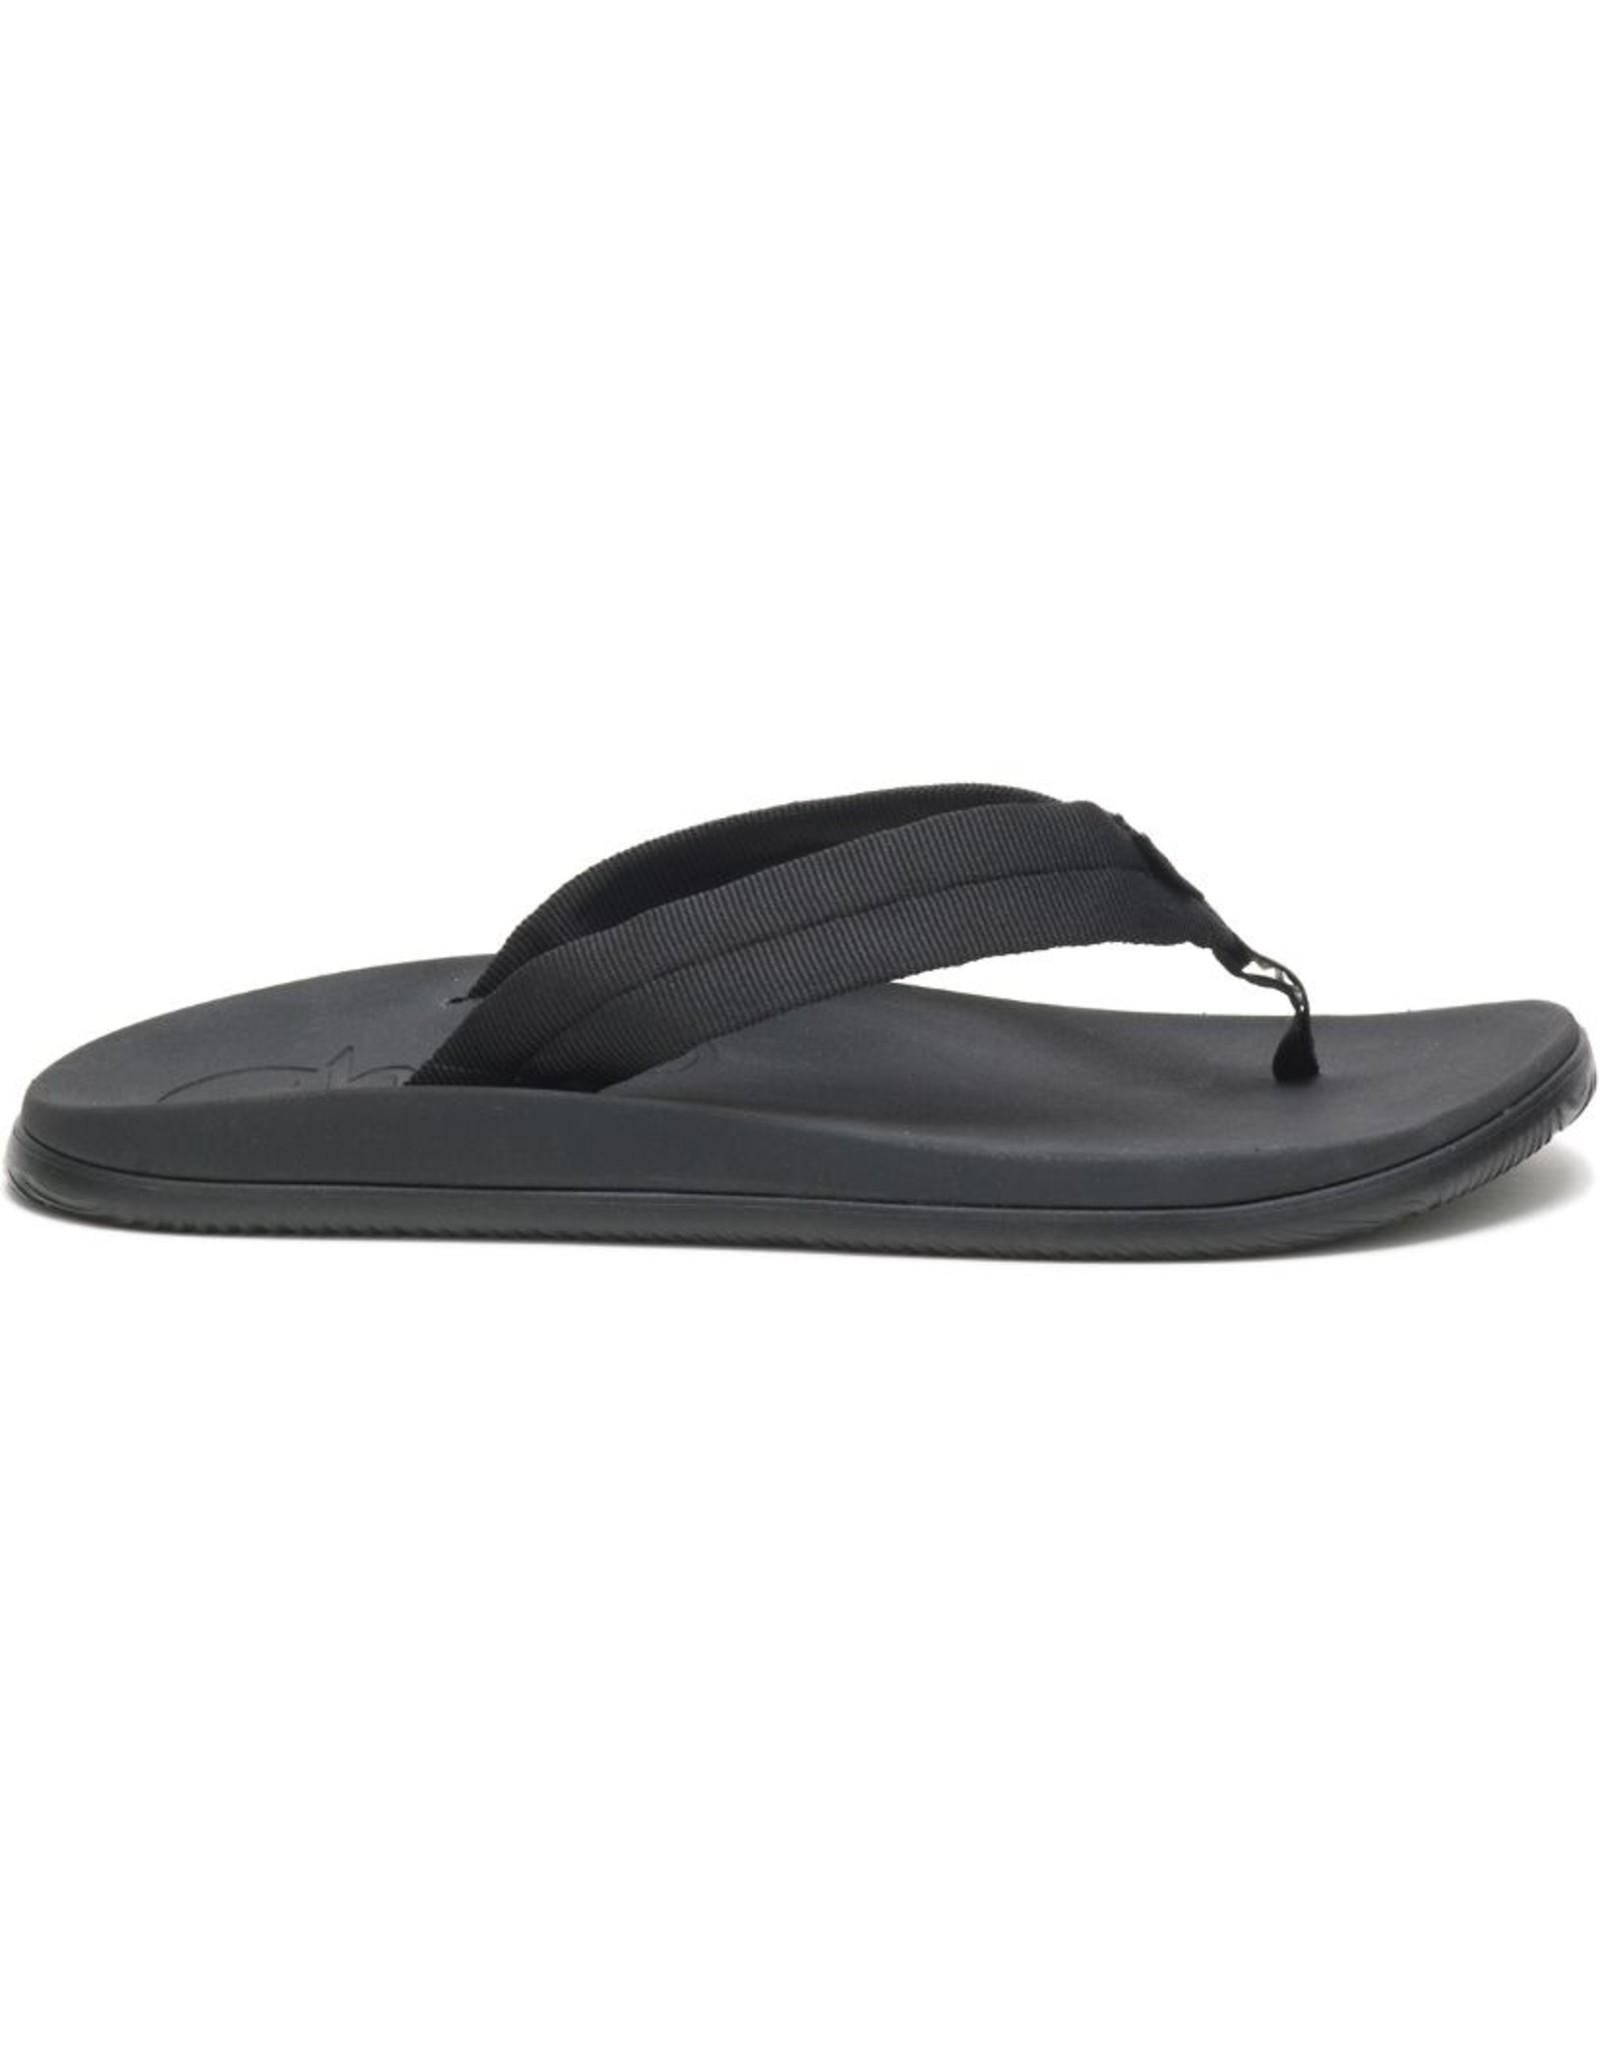 Chaco Chaco Men's Chillos Flip Sandals